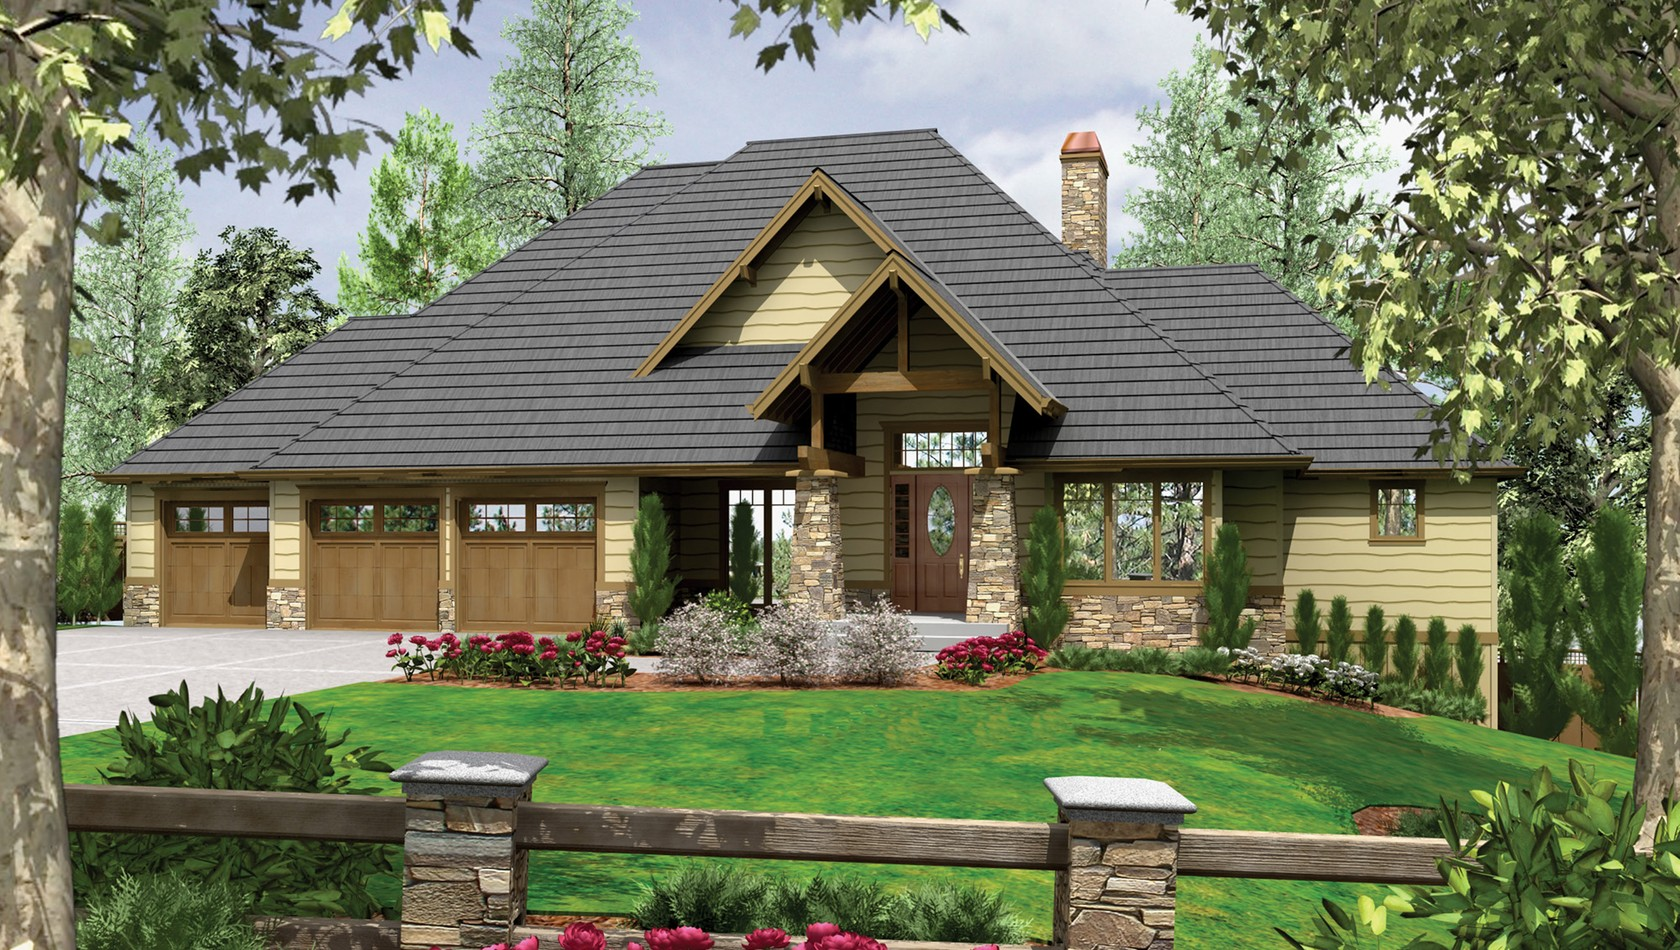 Main image for house plan 1324: The Lenhart